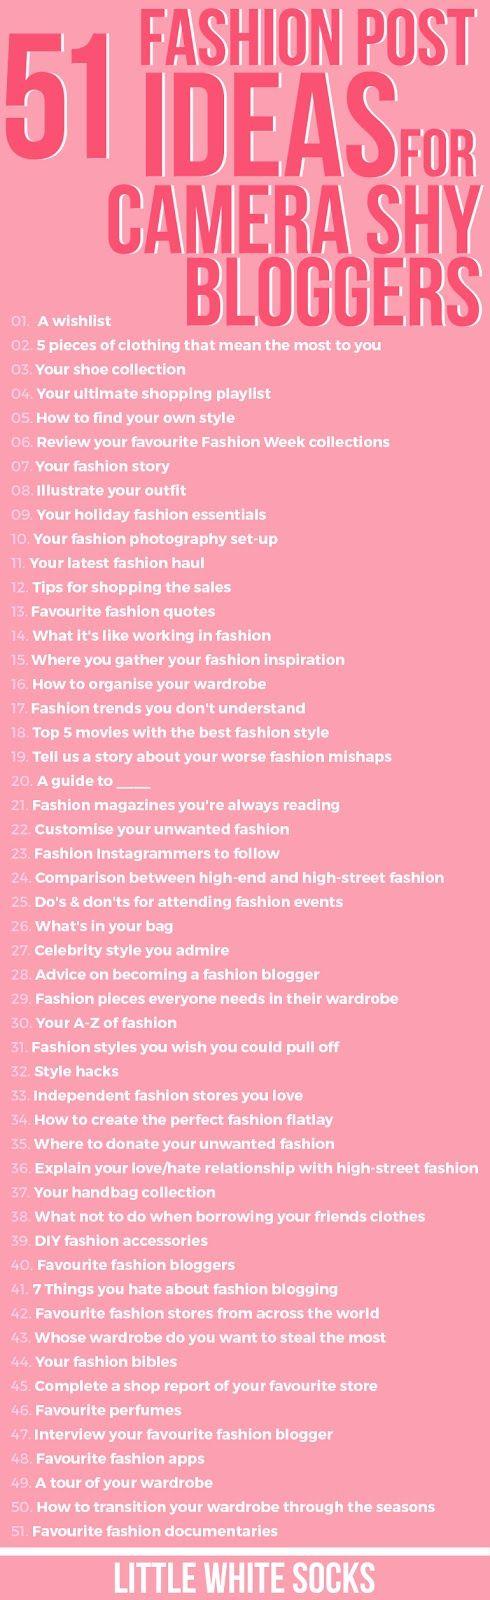 51 Fashion Post Ideas For The Camara Shy Blogger - Little White Socks